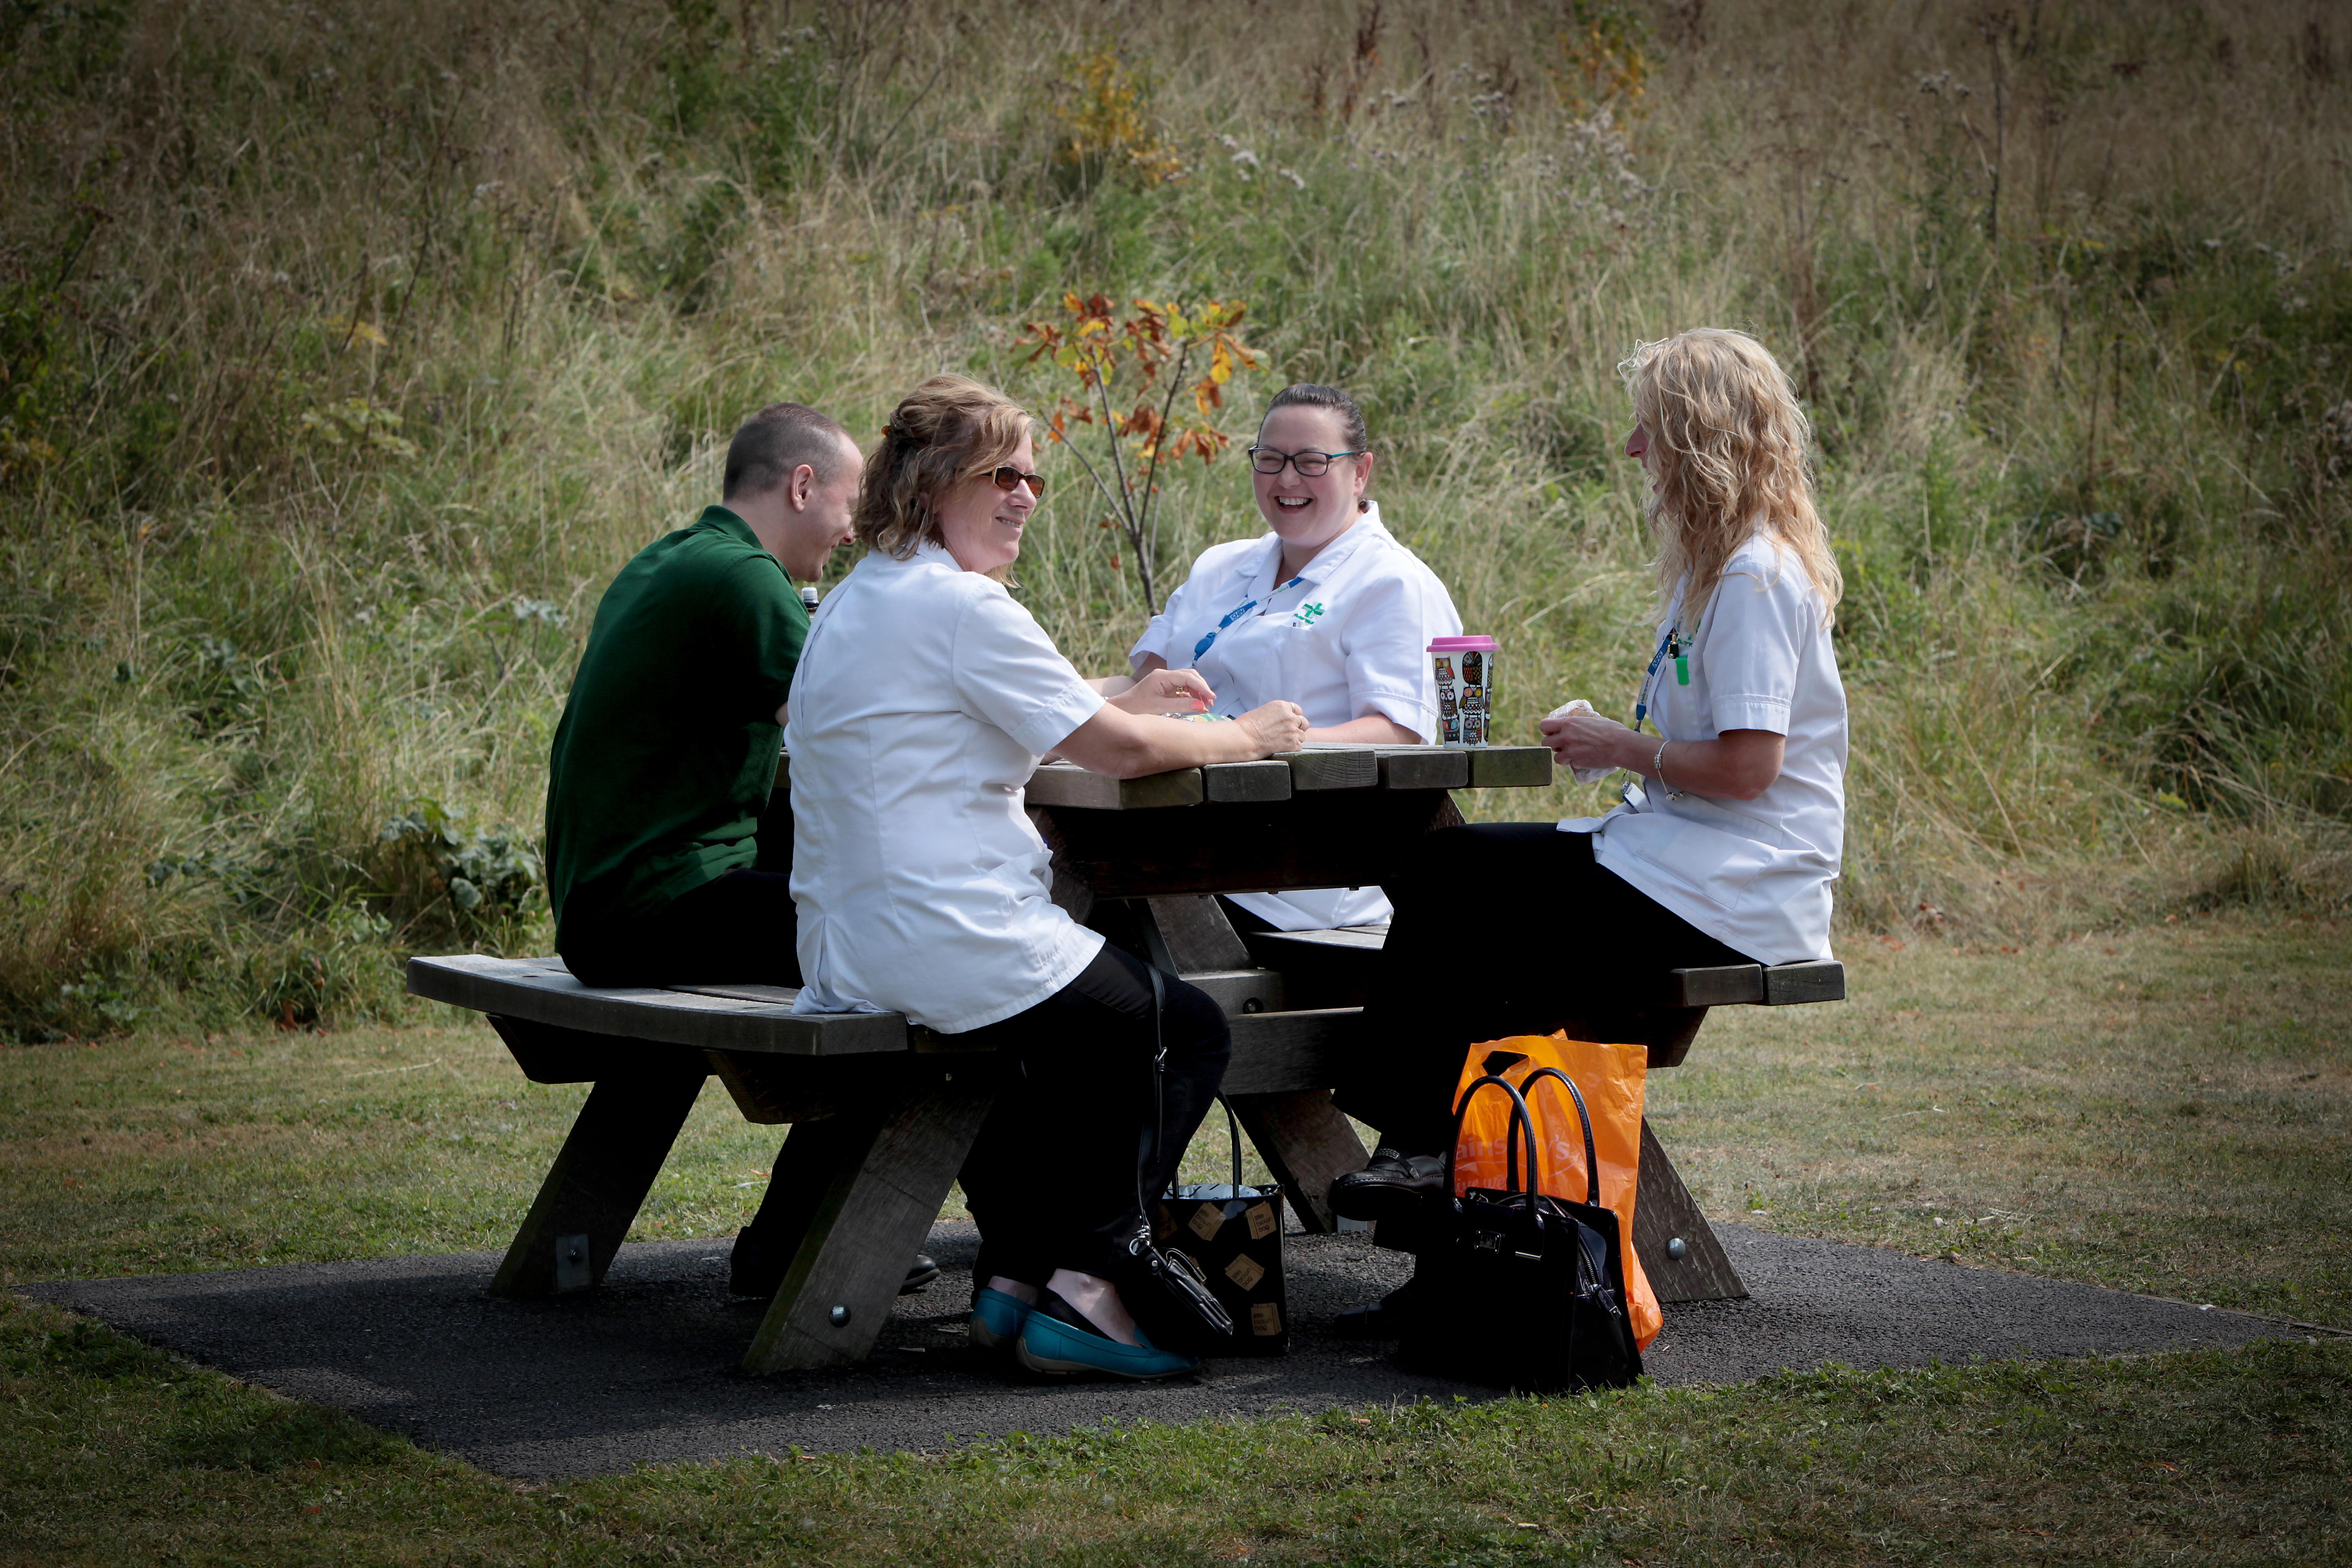 NHS staff in park